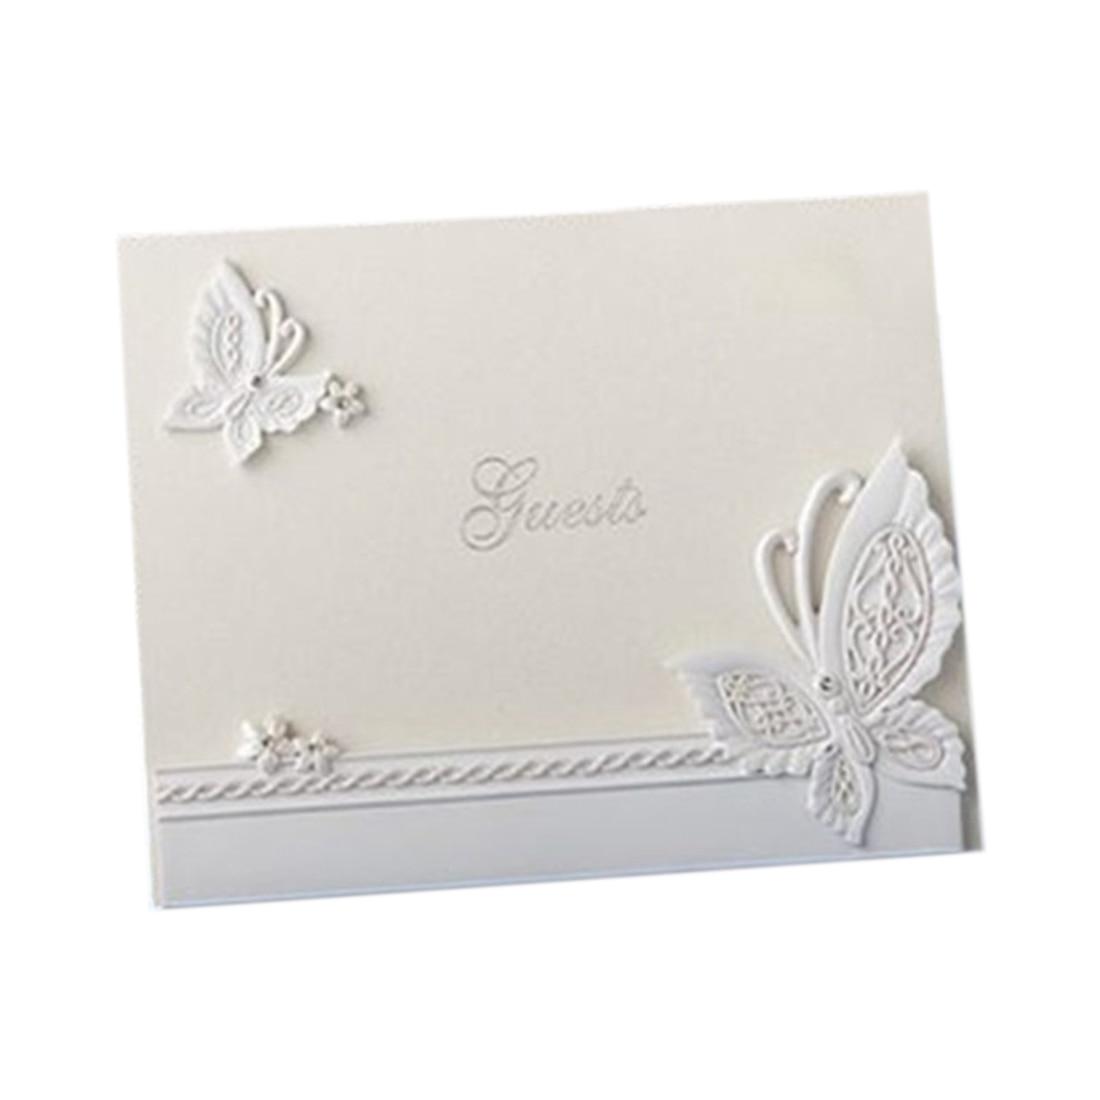 Elegant wedding guest book Diamante butterfly signature book